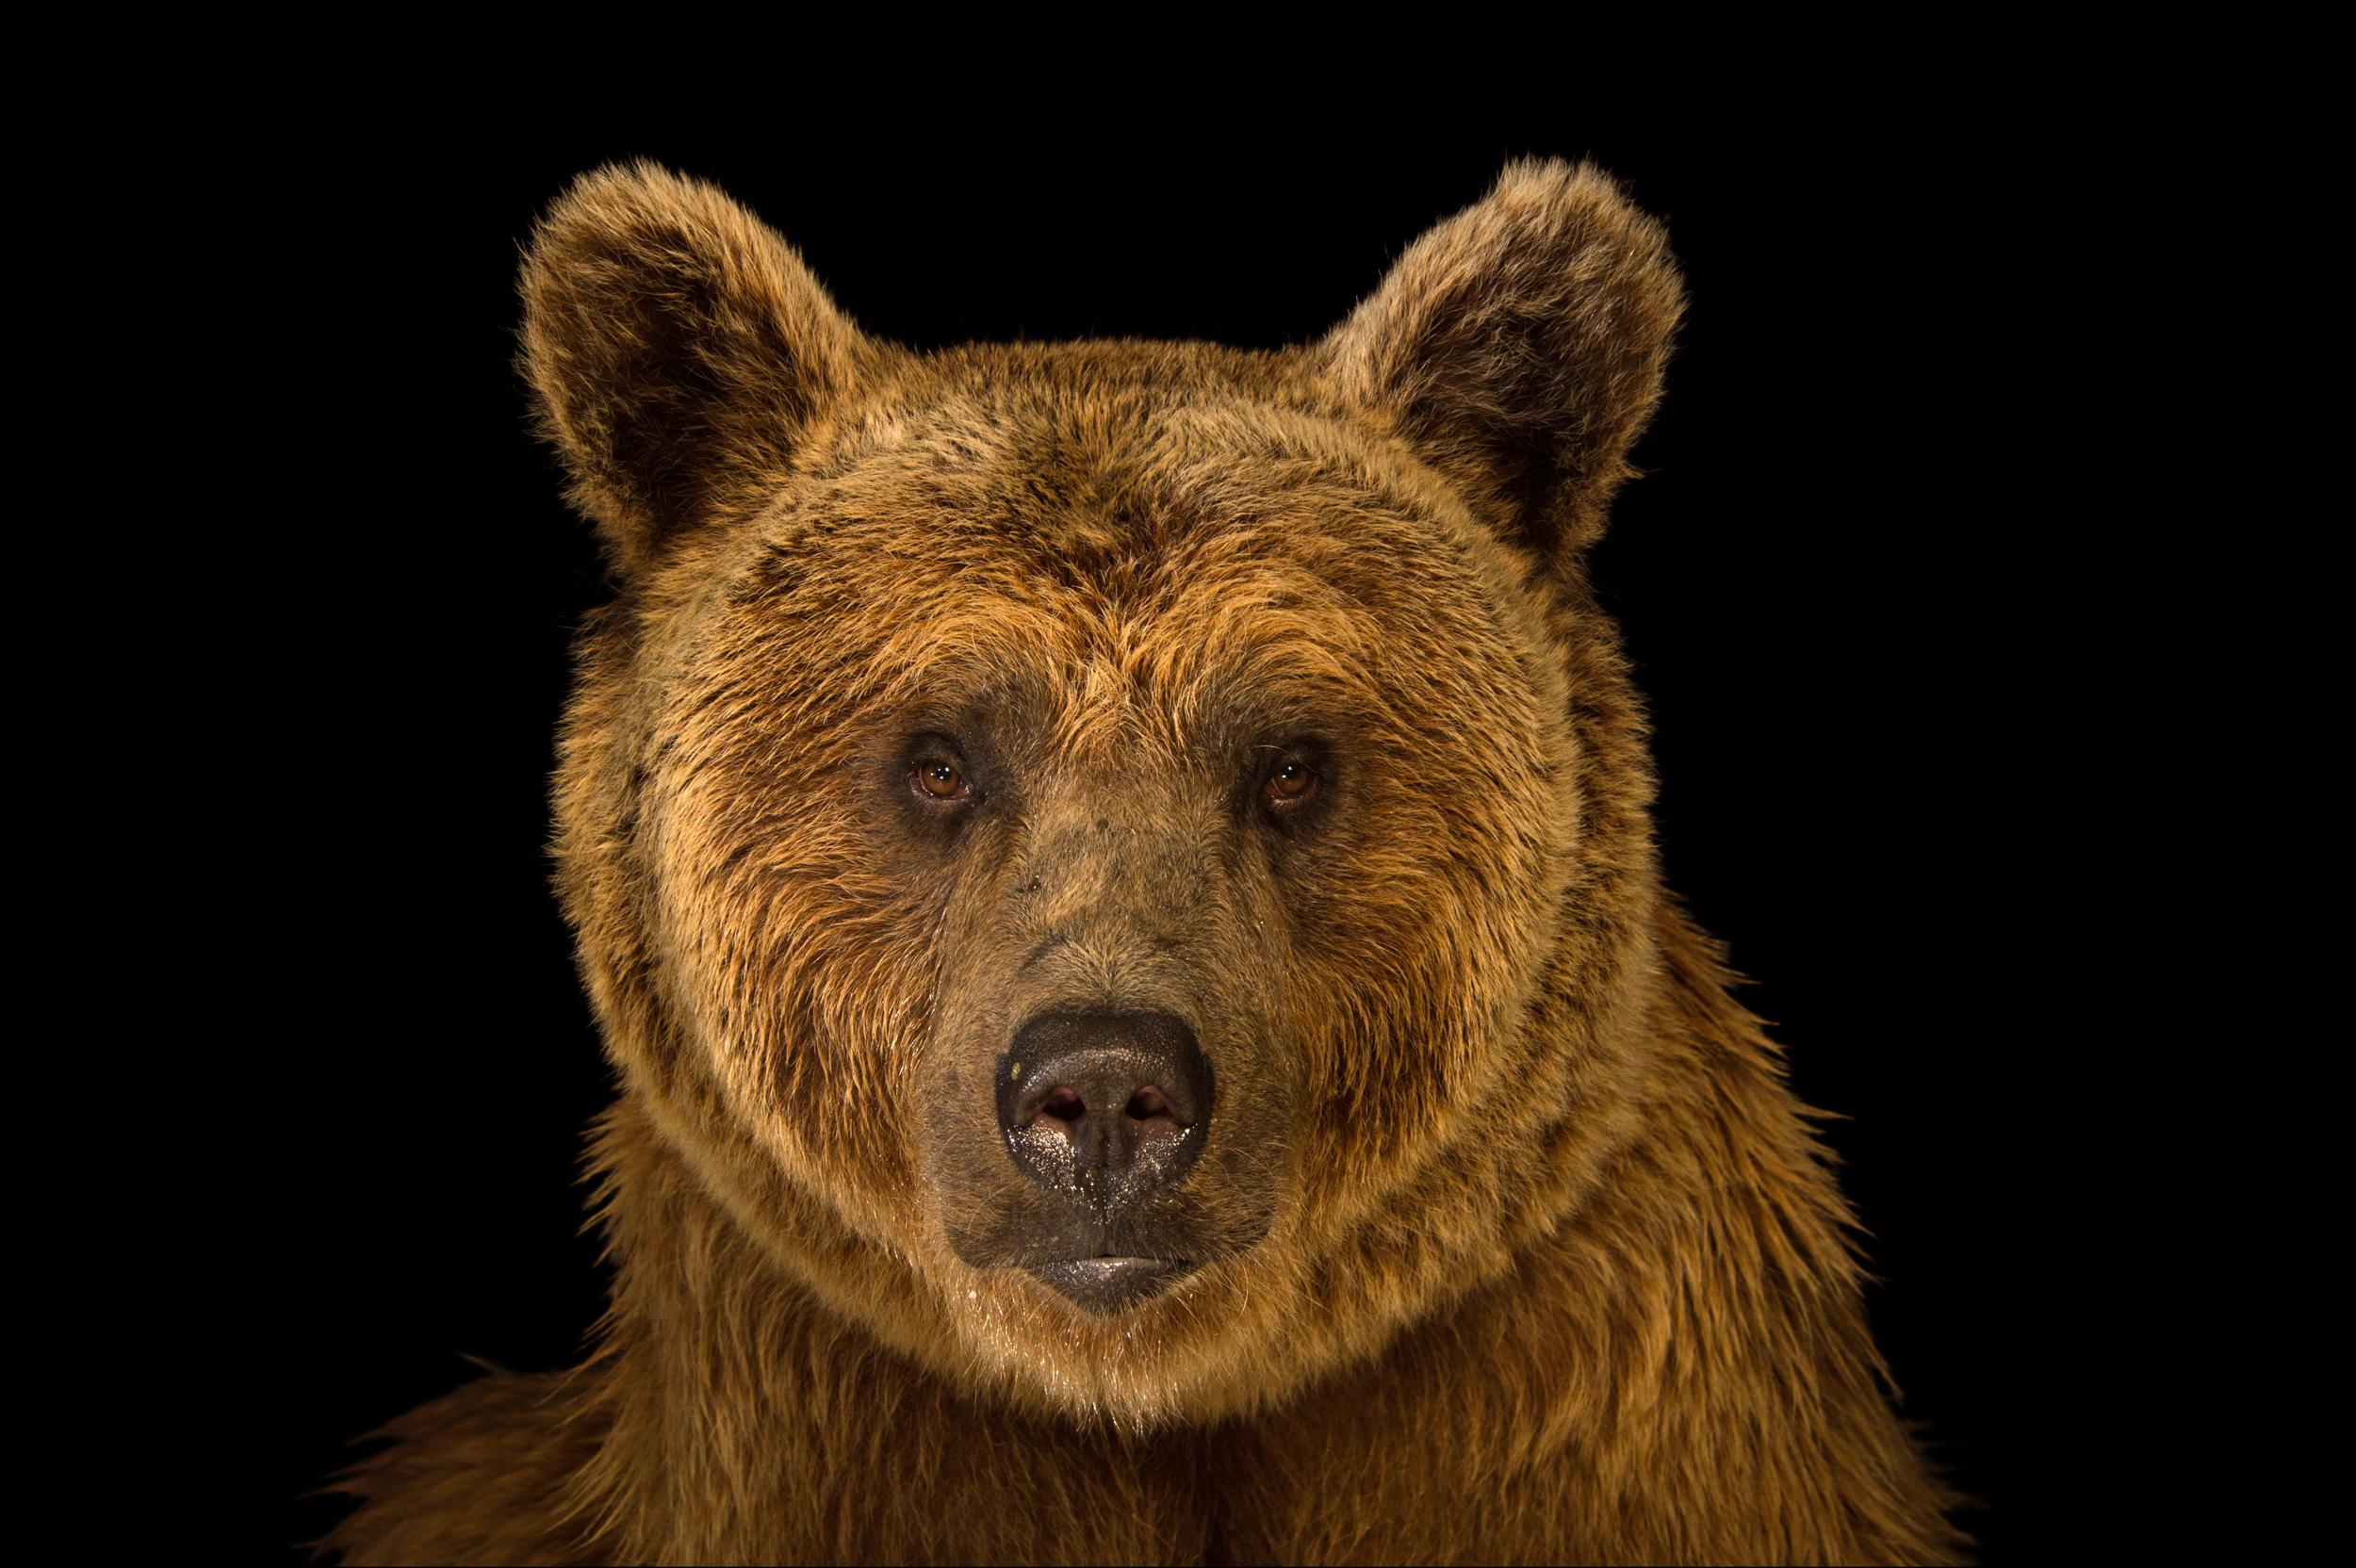 Syrian Brown Bear - Ursus arctos syriacus